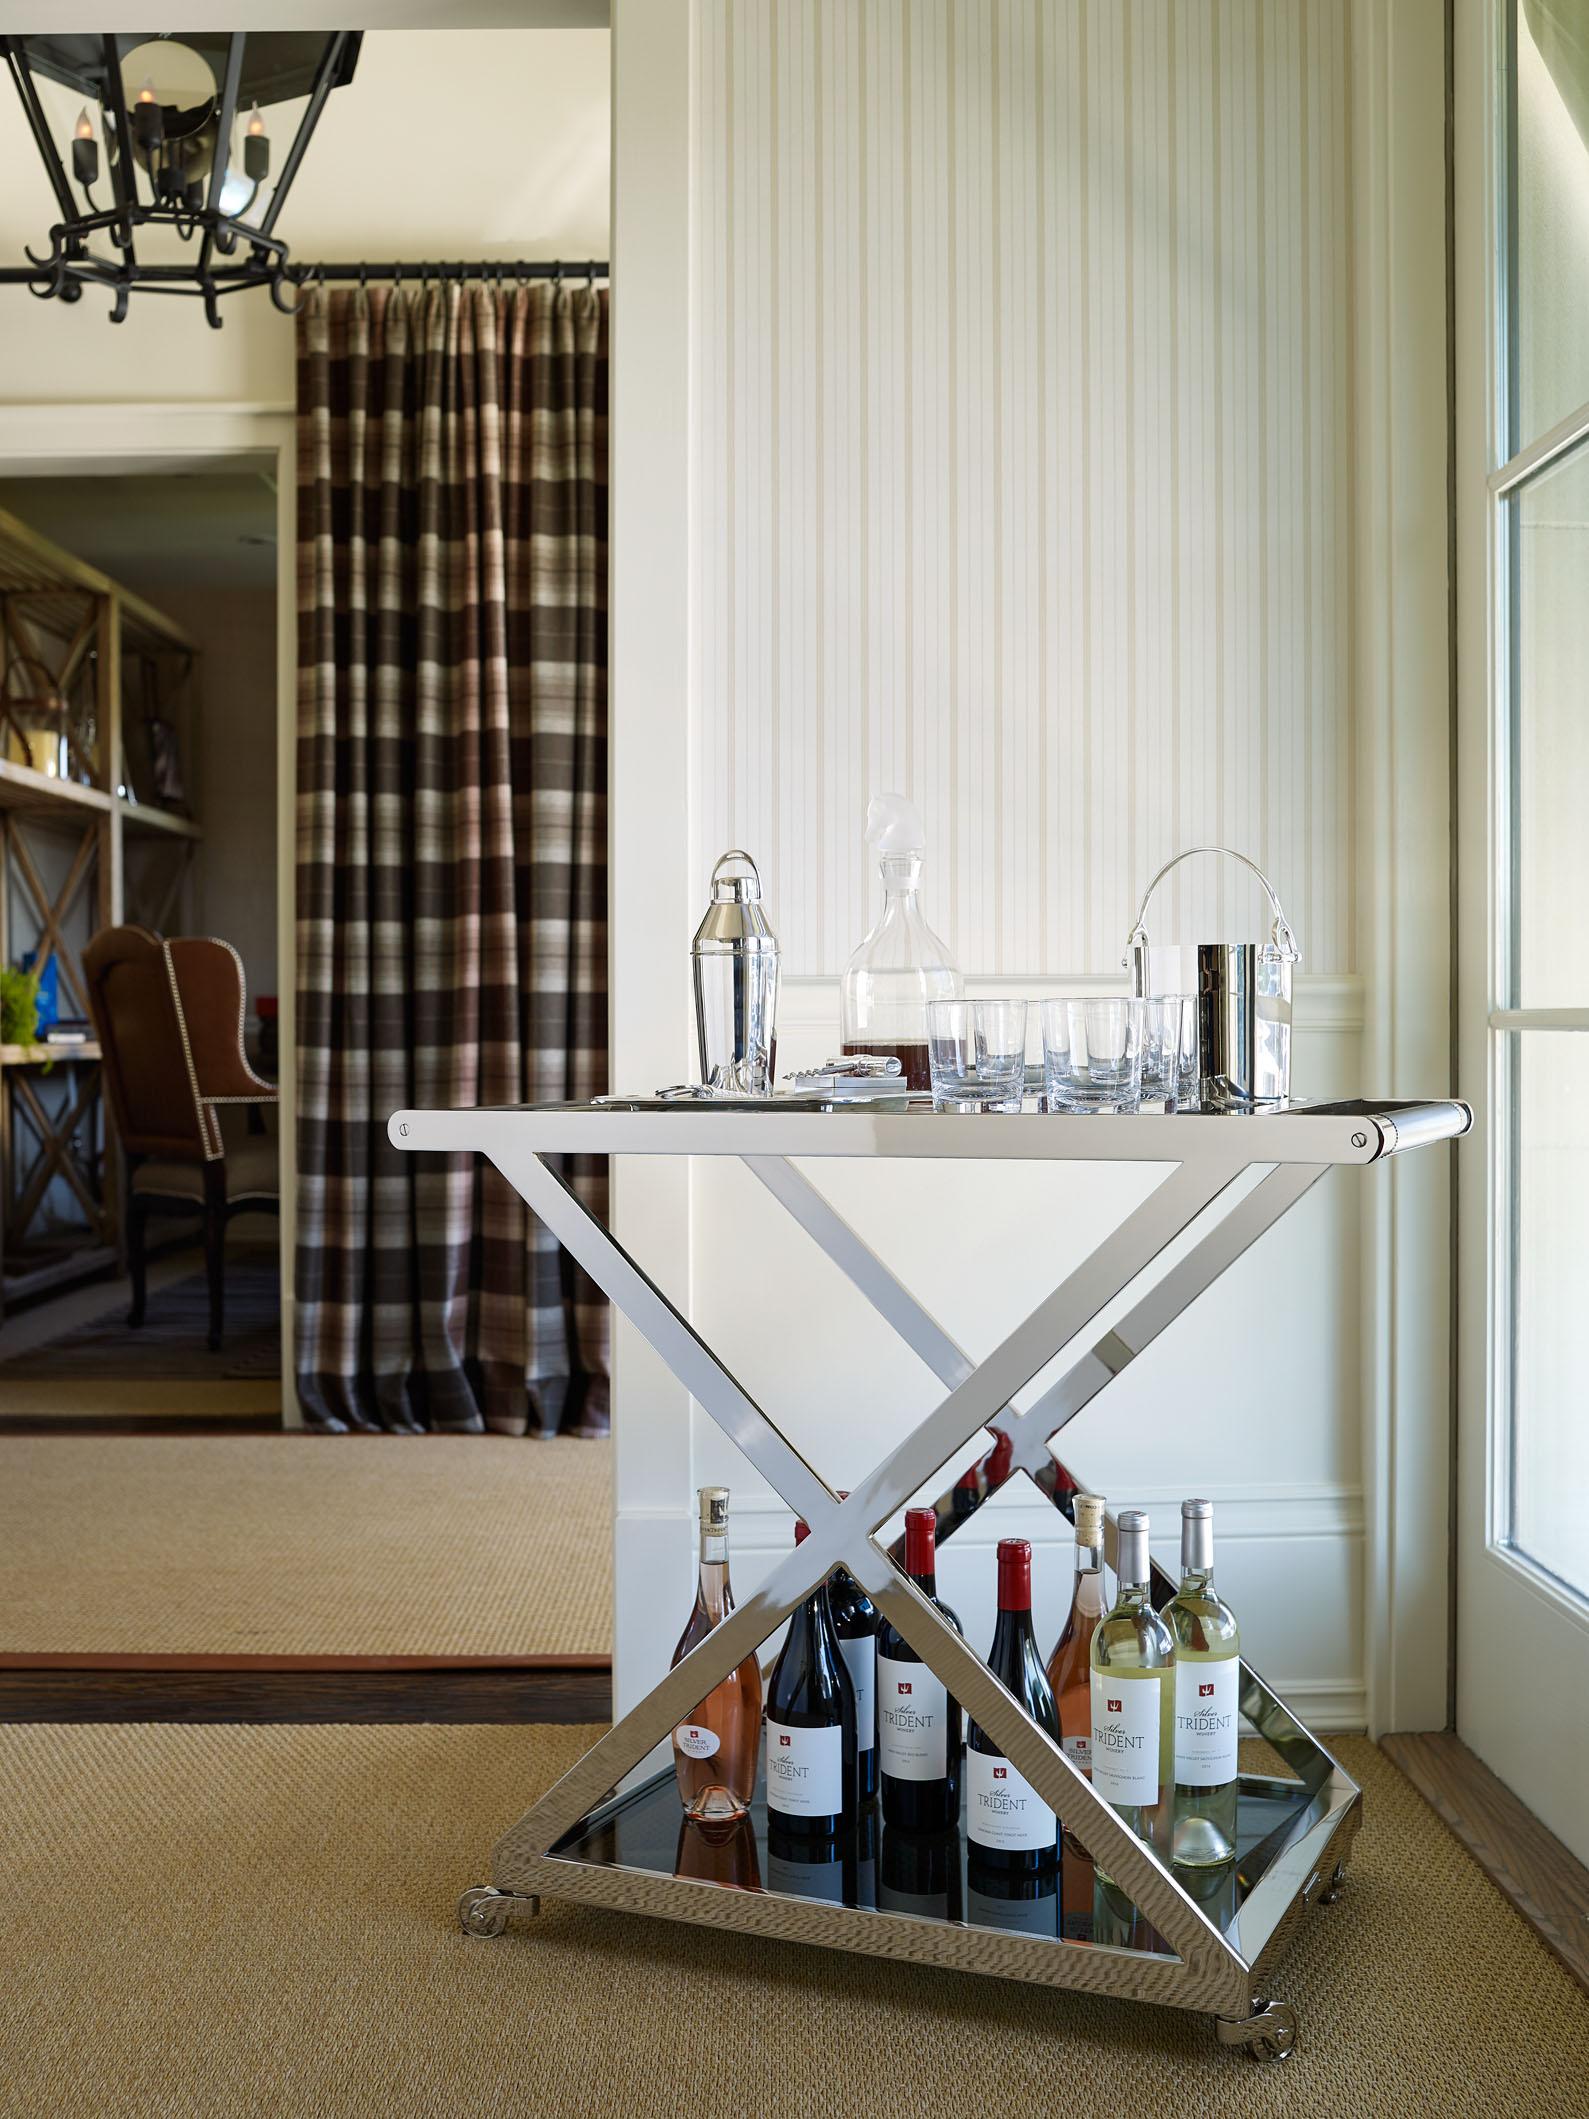 d7627c07da634 Silver Trident Winery - Marketing Tools - Photos